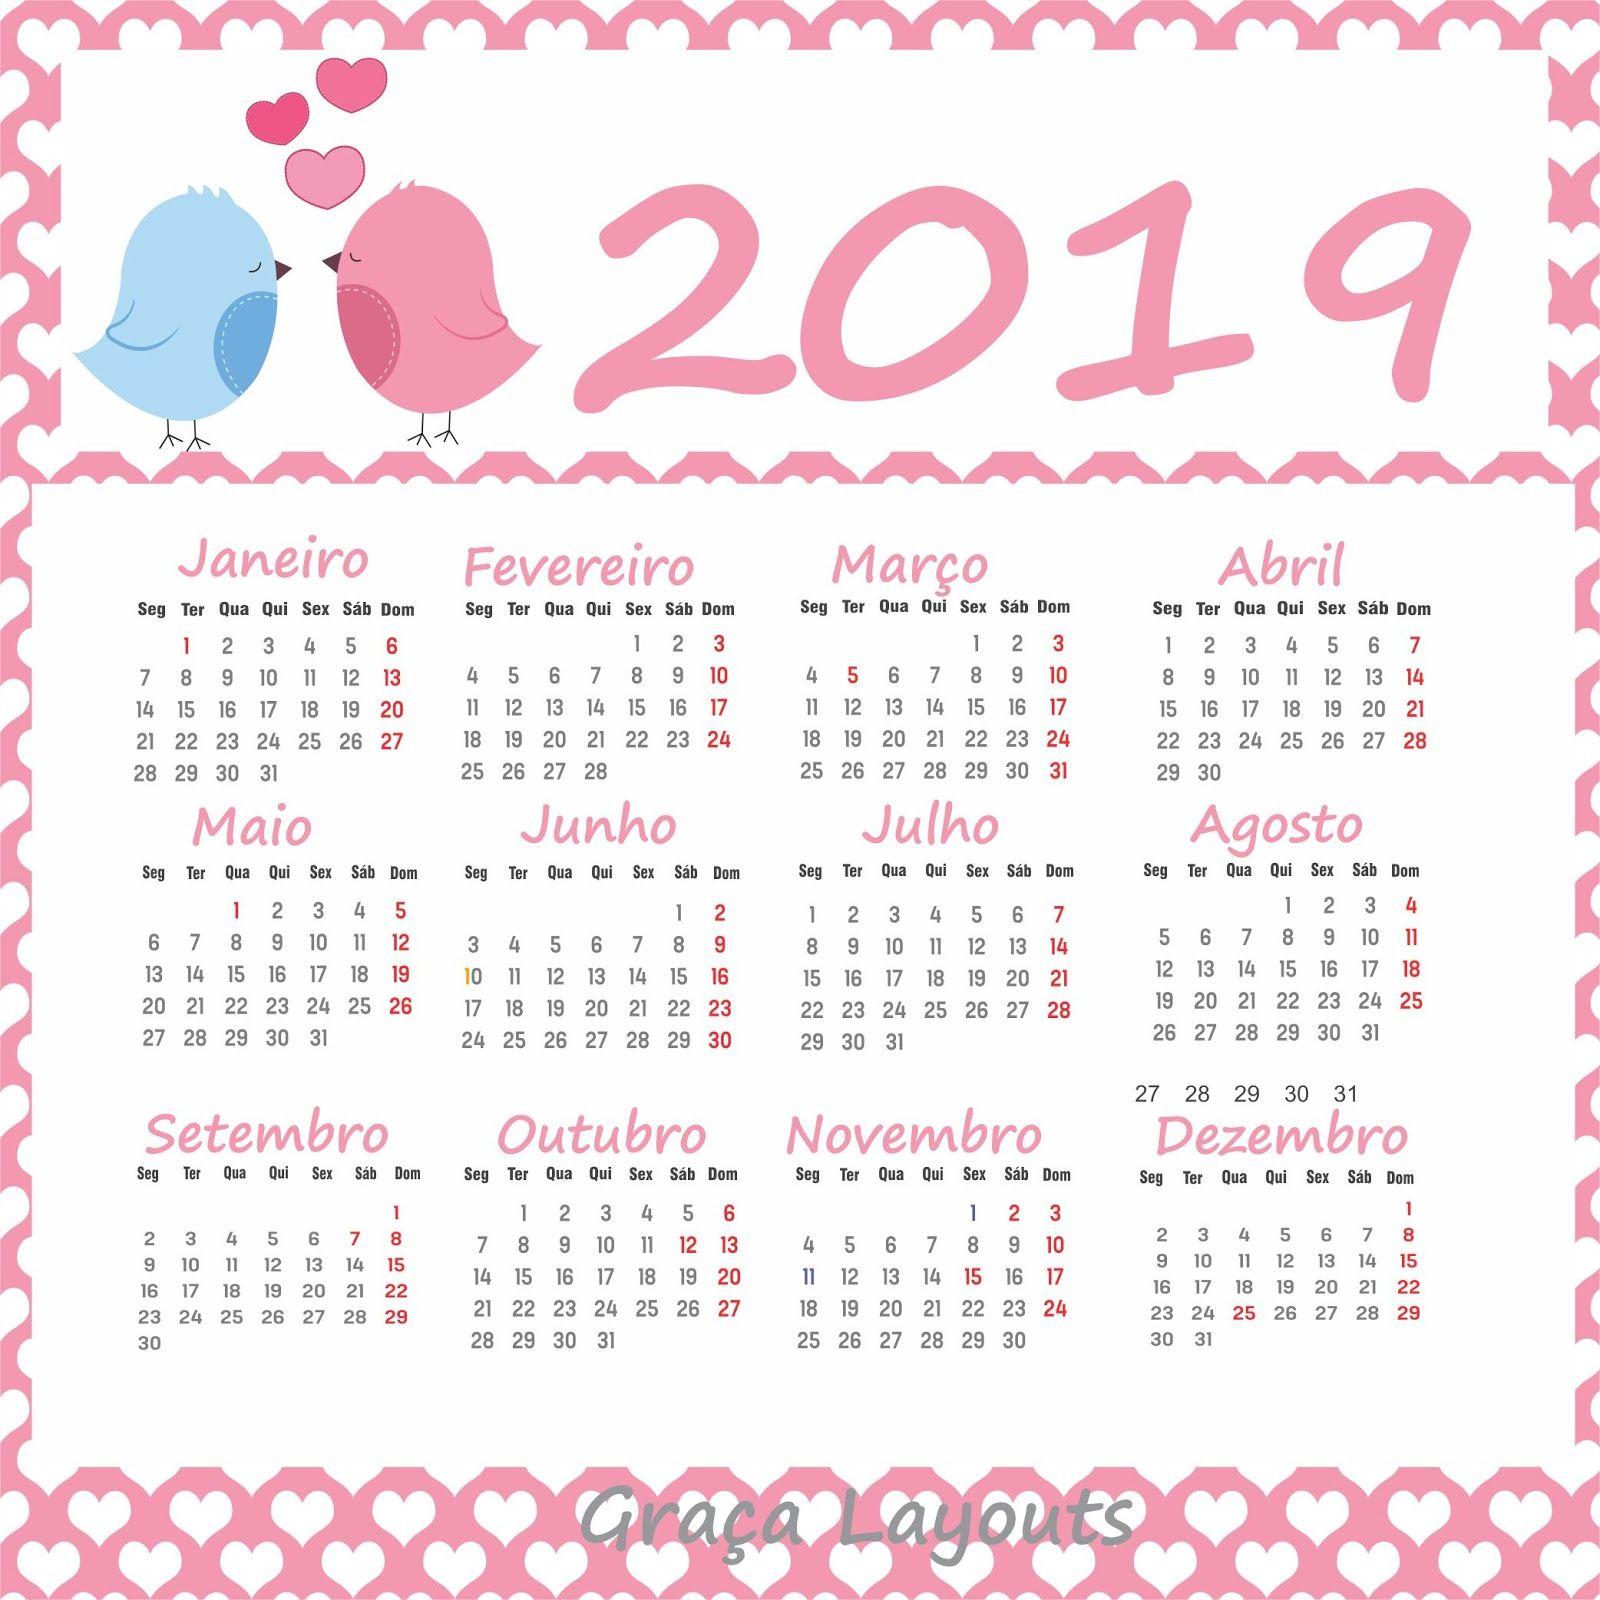 Calendario 2019 Rosa Portugues.Calendarios 2019 Gratis Graca Maestria Ideias De